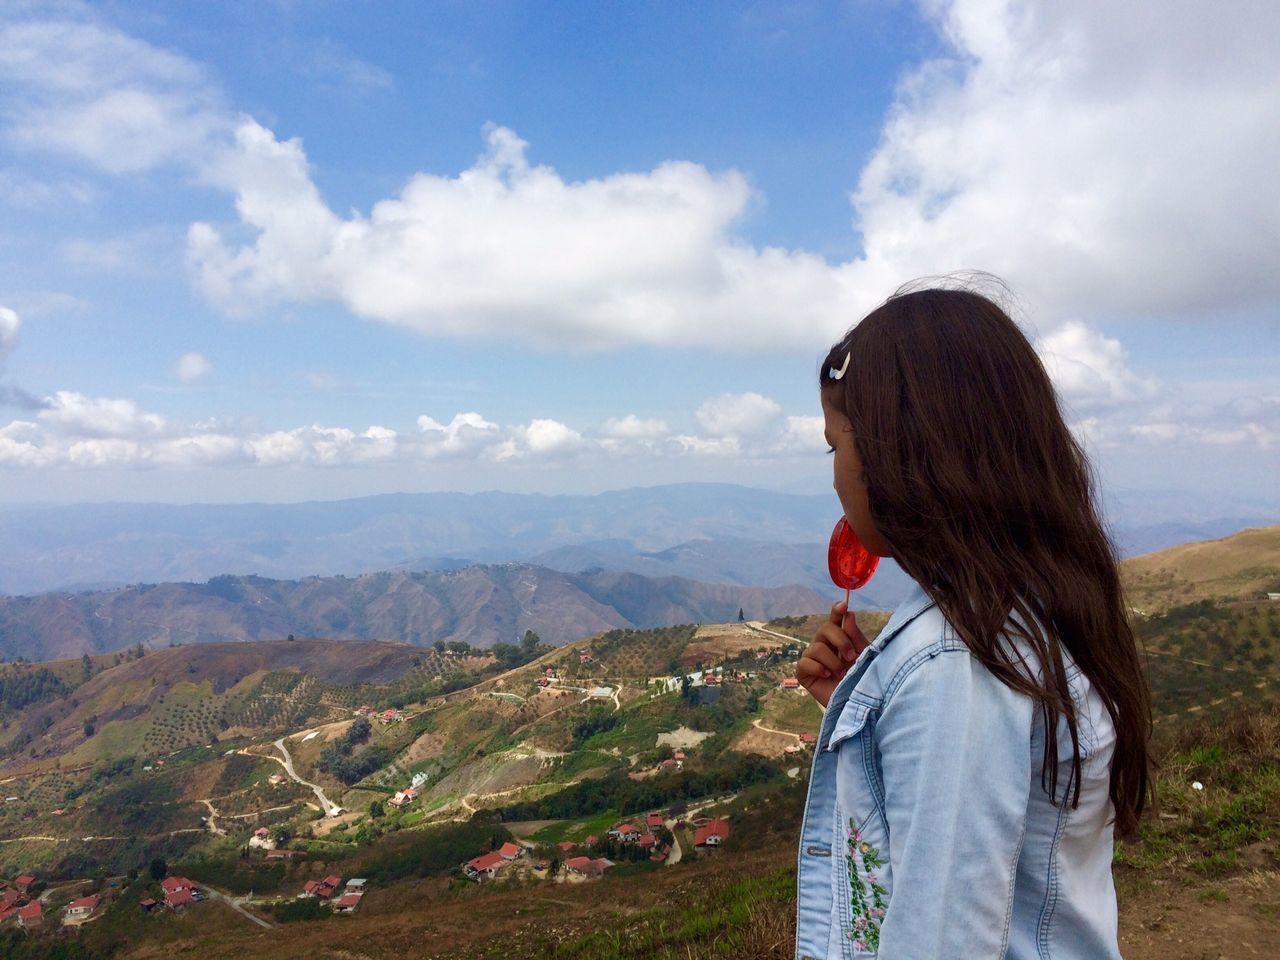 Beauty In Nature Landscape Lifestyles Mountain Mountain Range Nature Outdoors Tourism Tourist Tranquil Scene Tranquility Venezuela